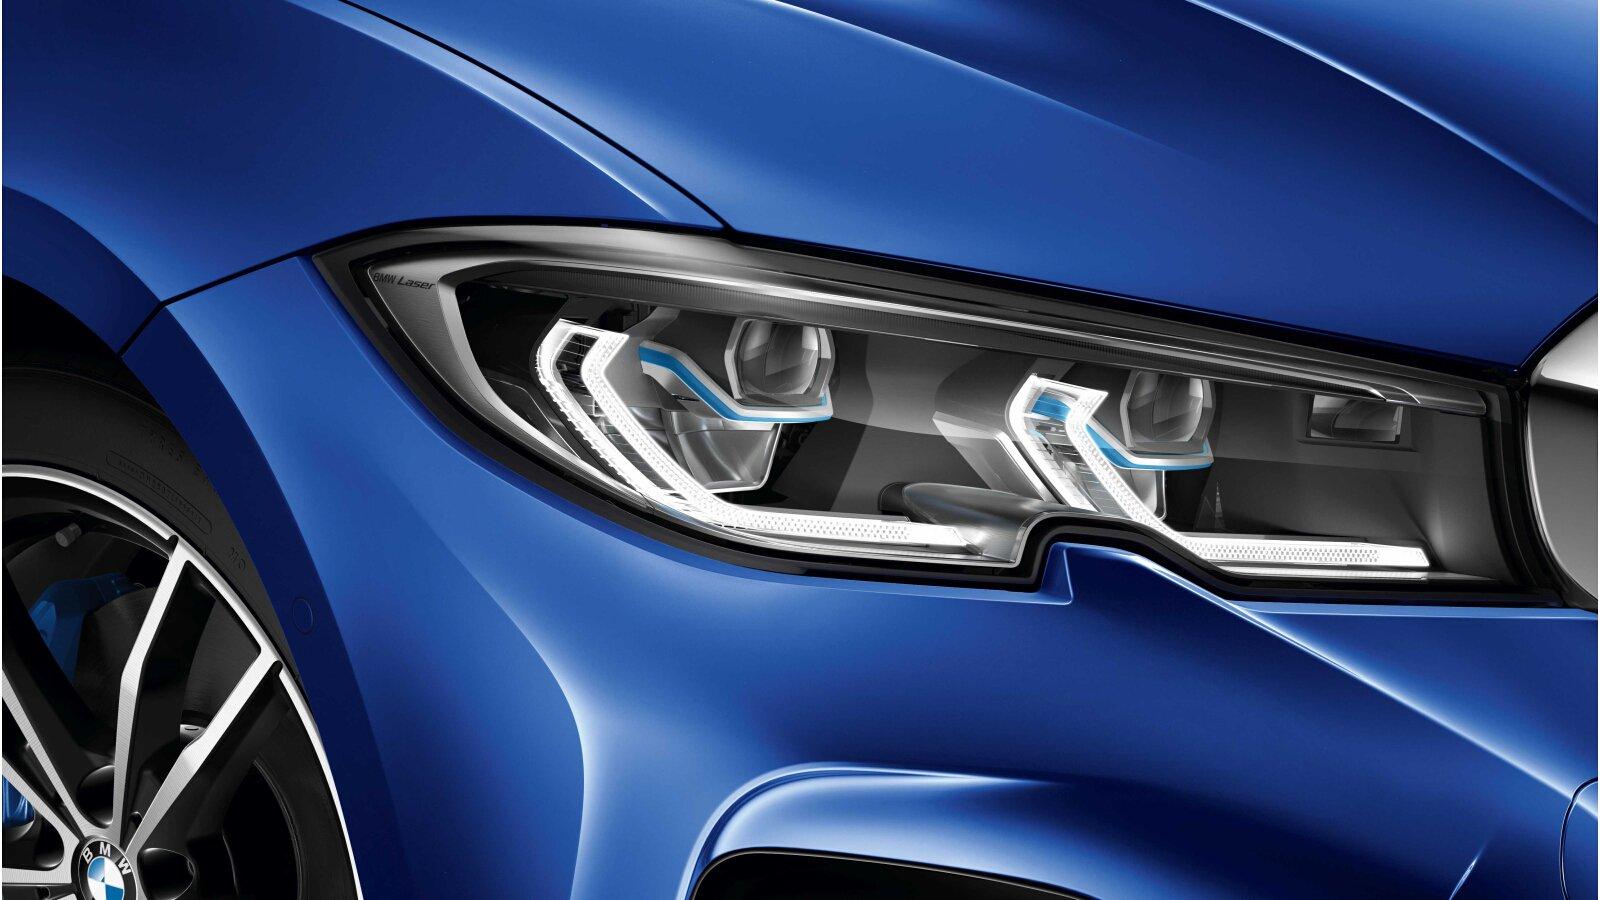 BMW 3 Series 2019 leaked photos (16)